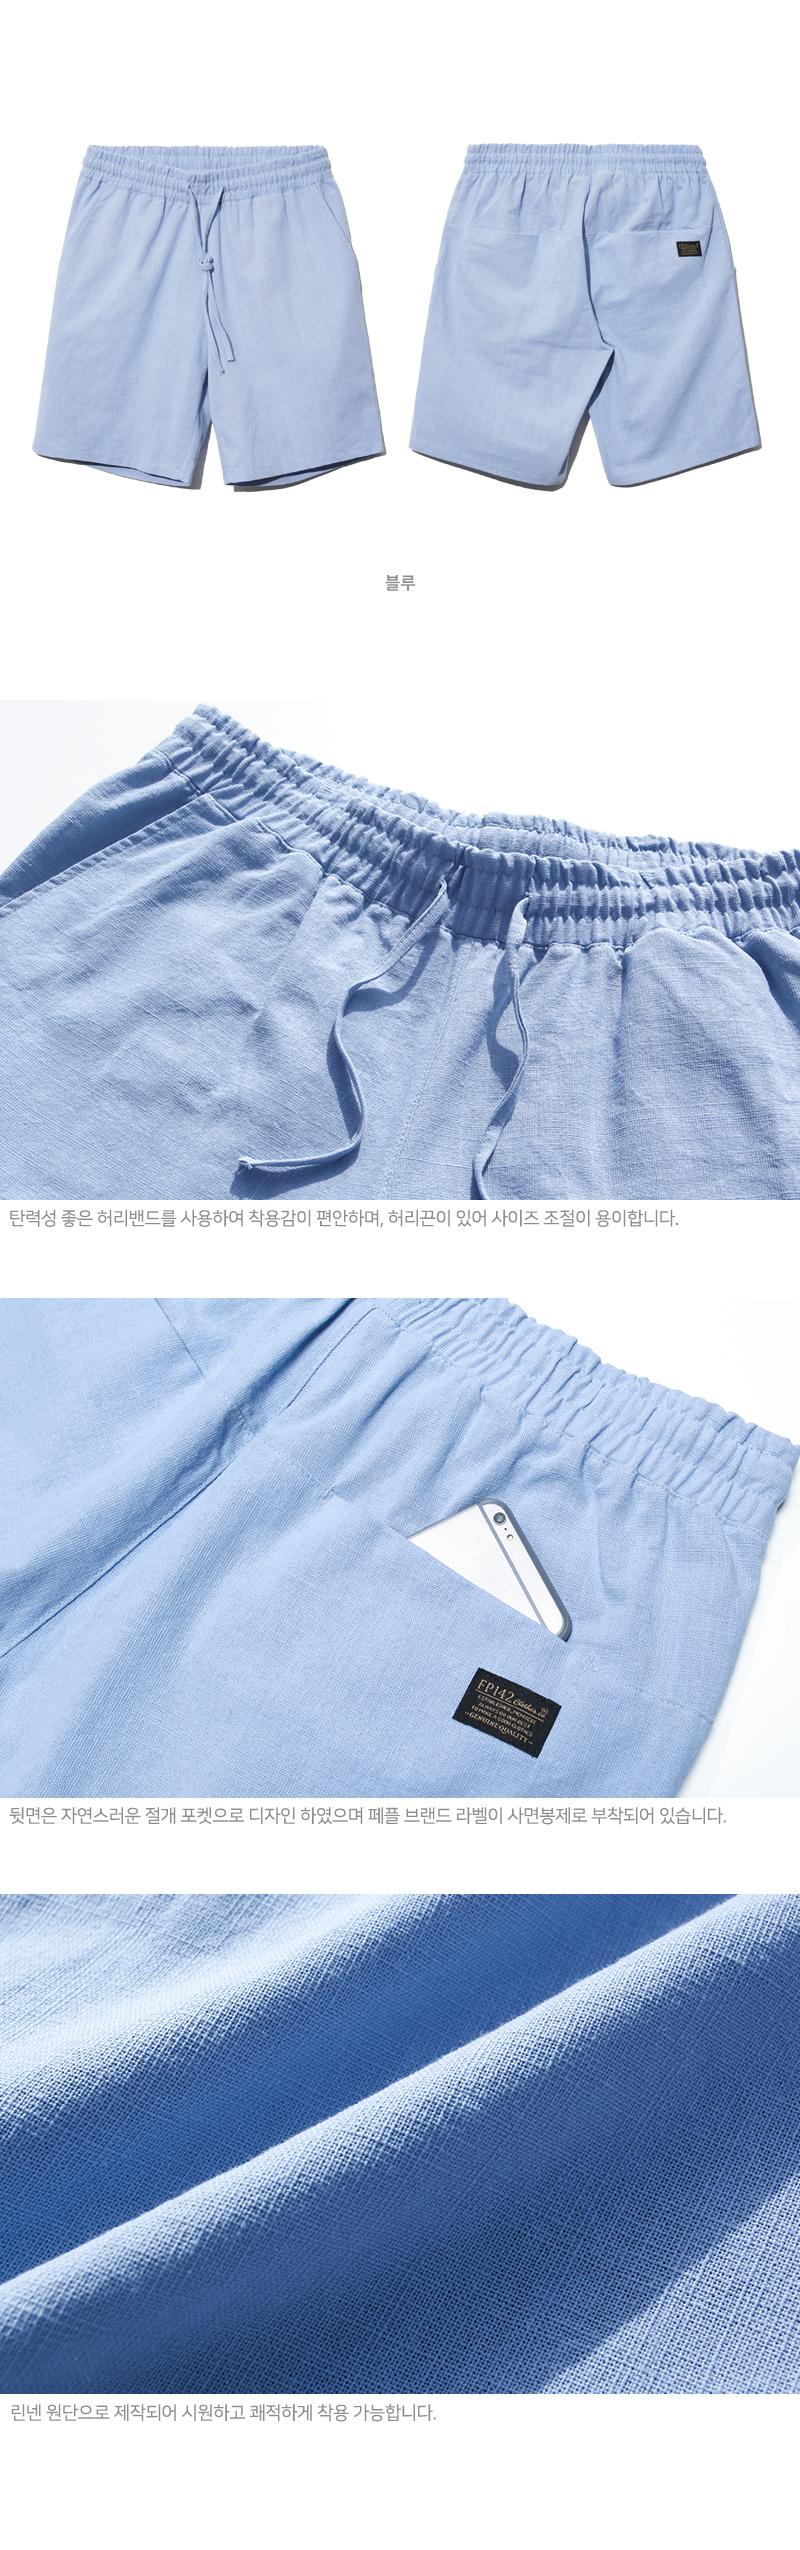 20190422_fp_realcooshortpants_detail_blue.jpg